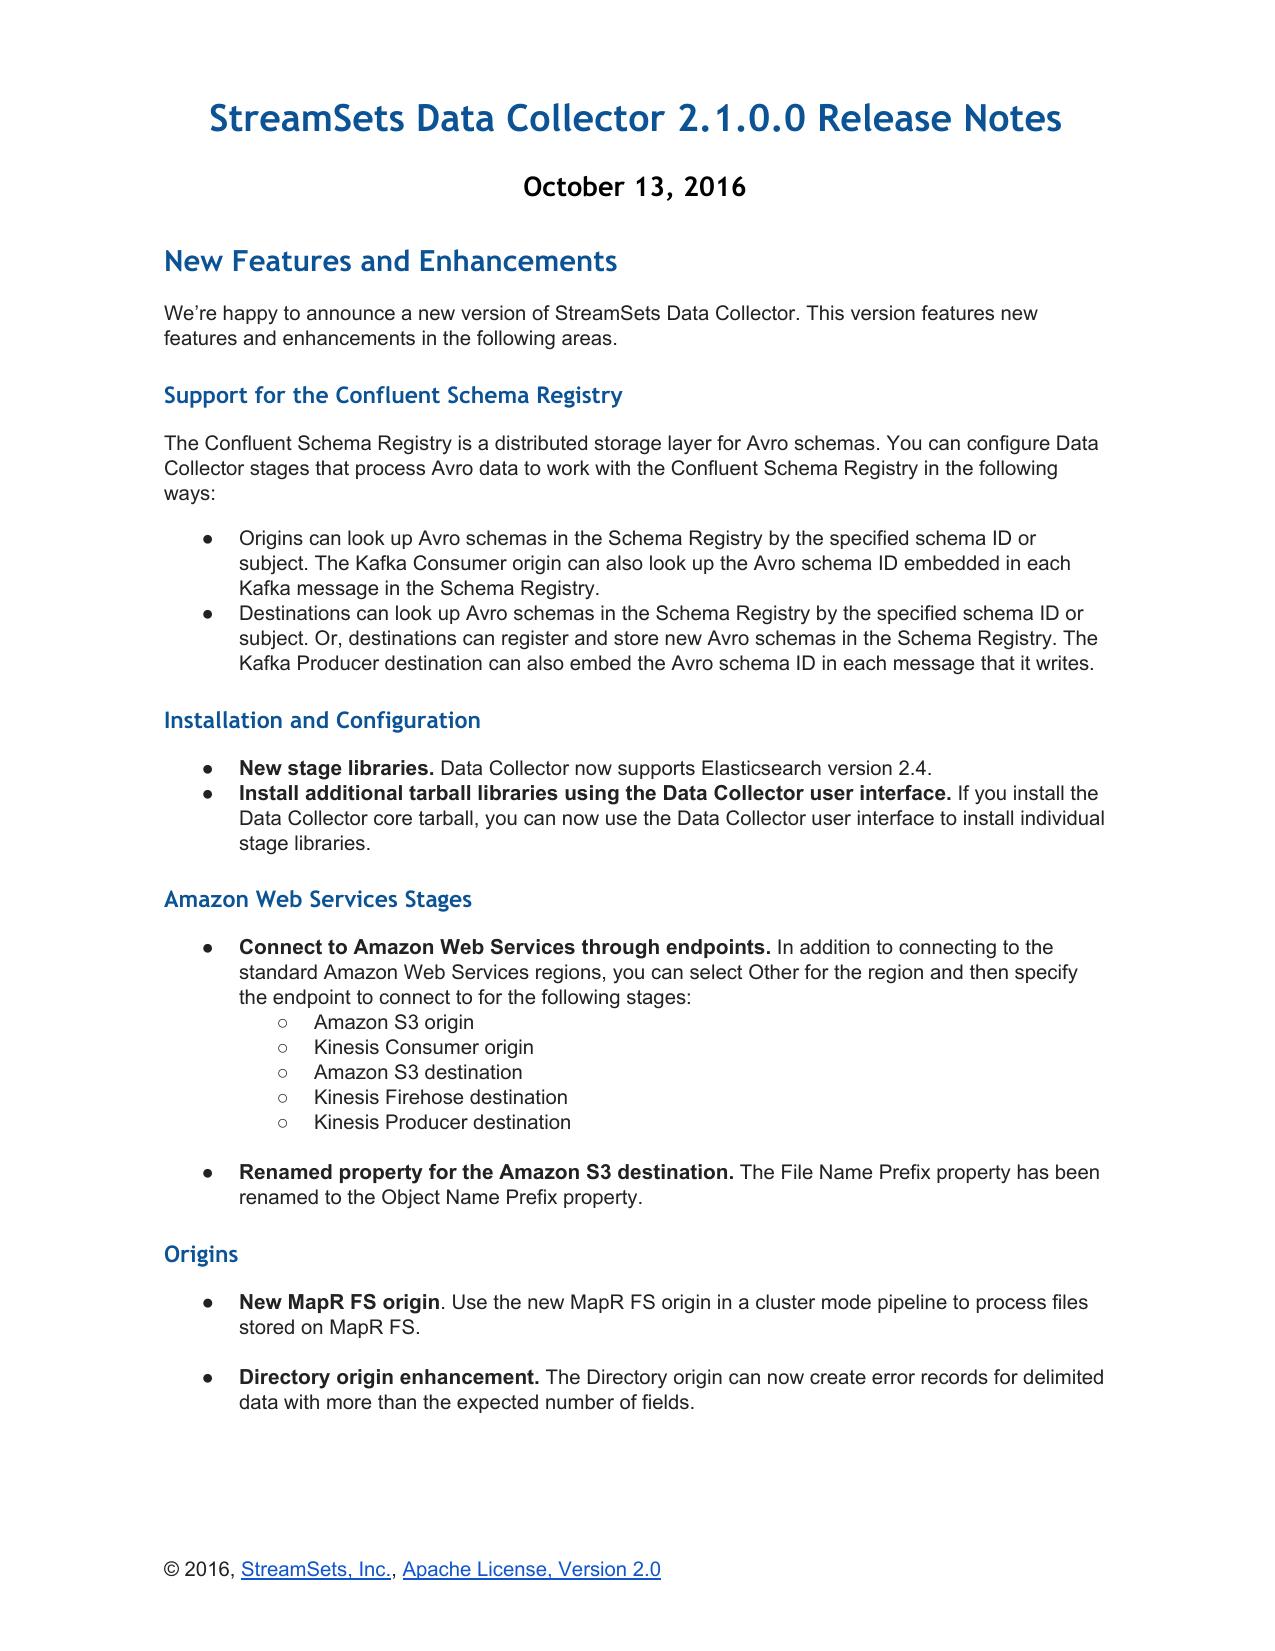 StreamSets Data Collector 2 1 0 0 Release Notes | manualzz com